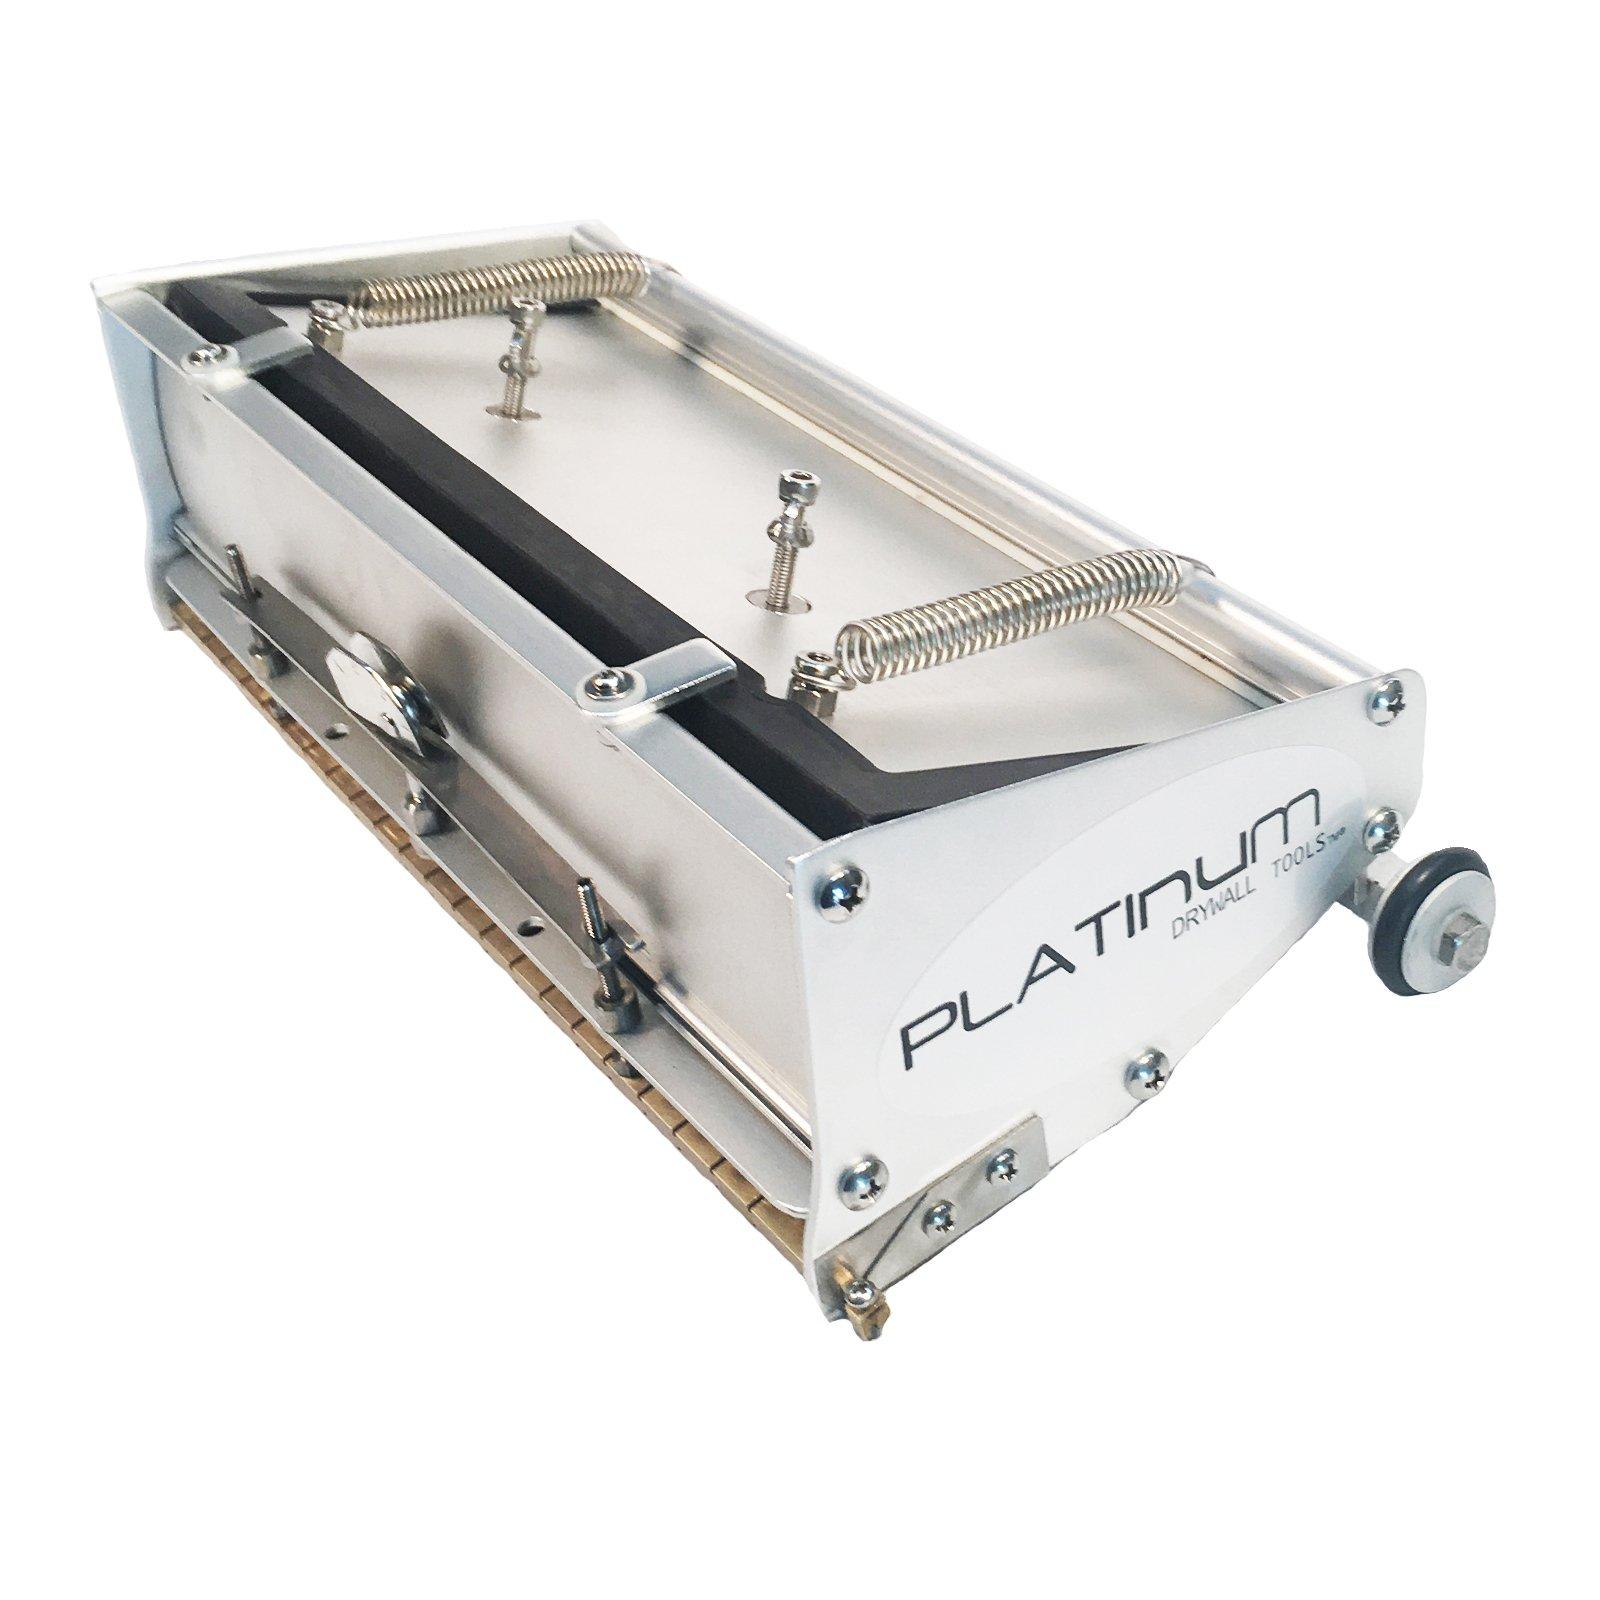 Platinum Drywall Tools 12'' Drywall Flat Finishing Box by Platinum Drywall Tools